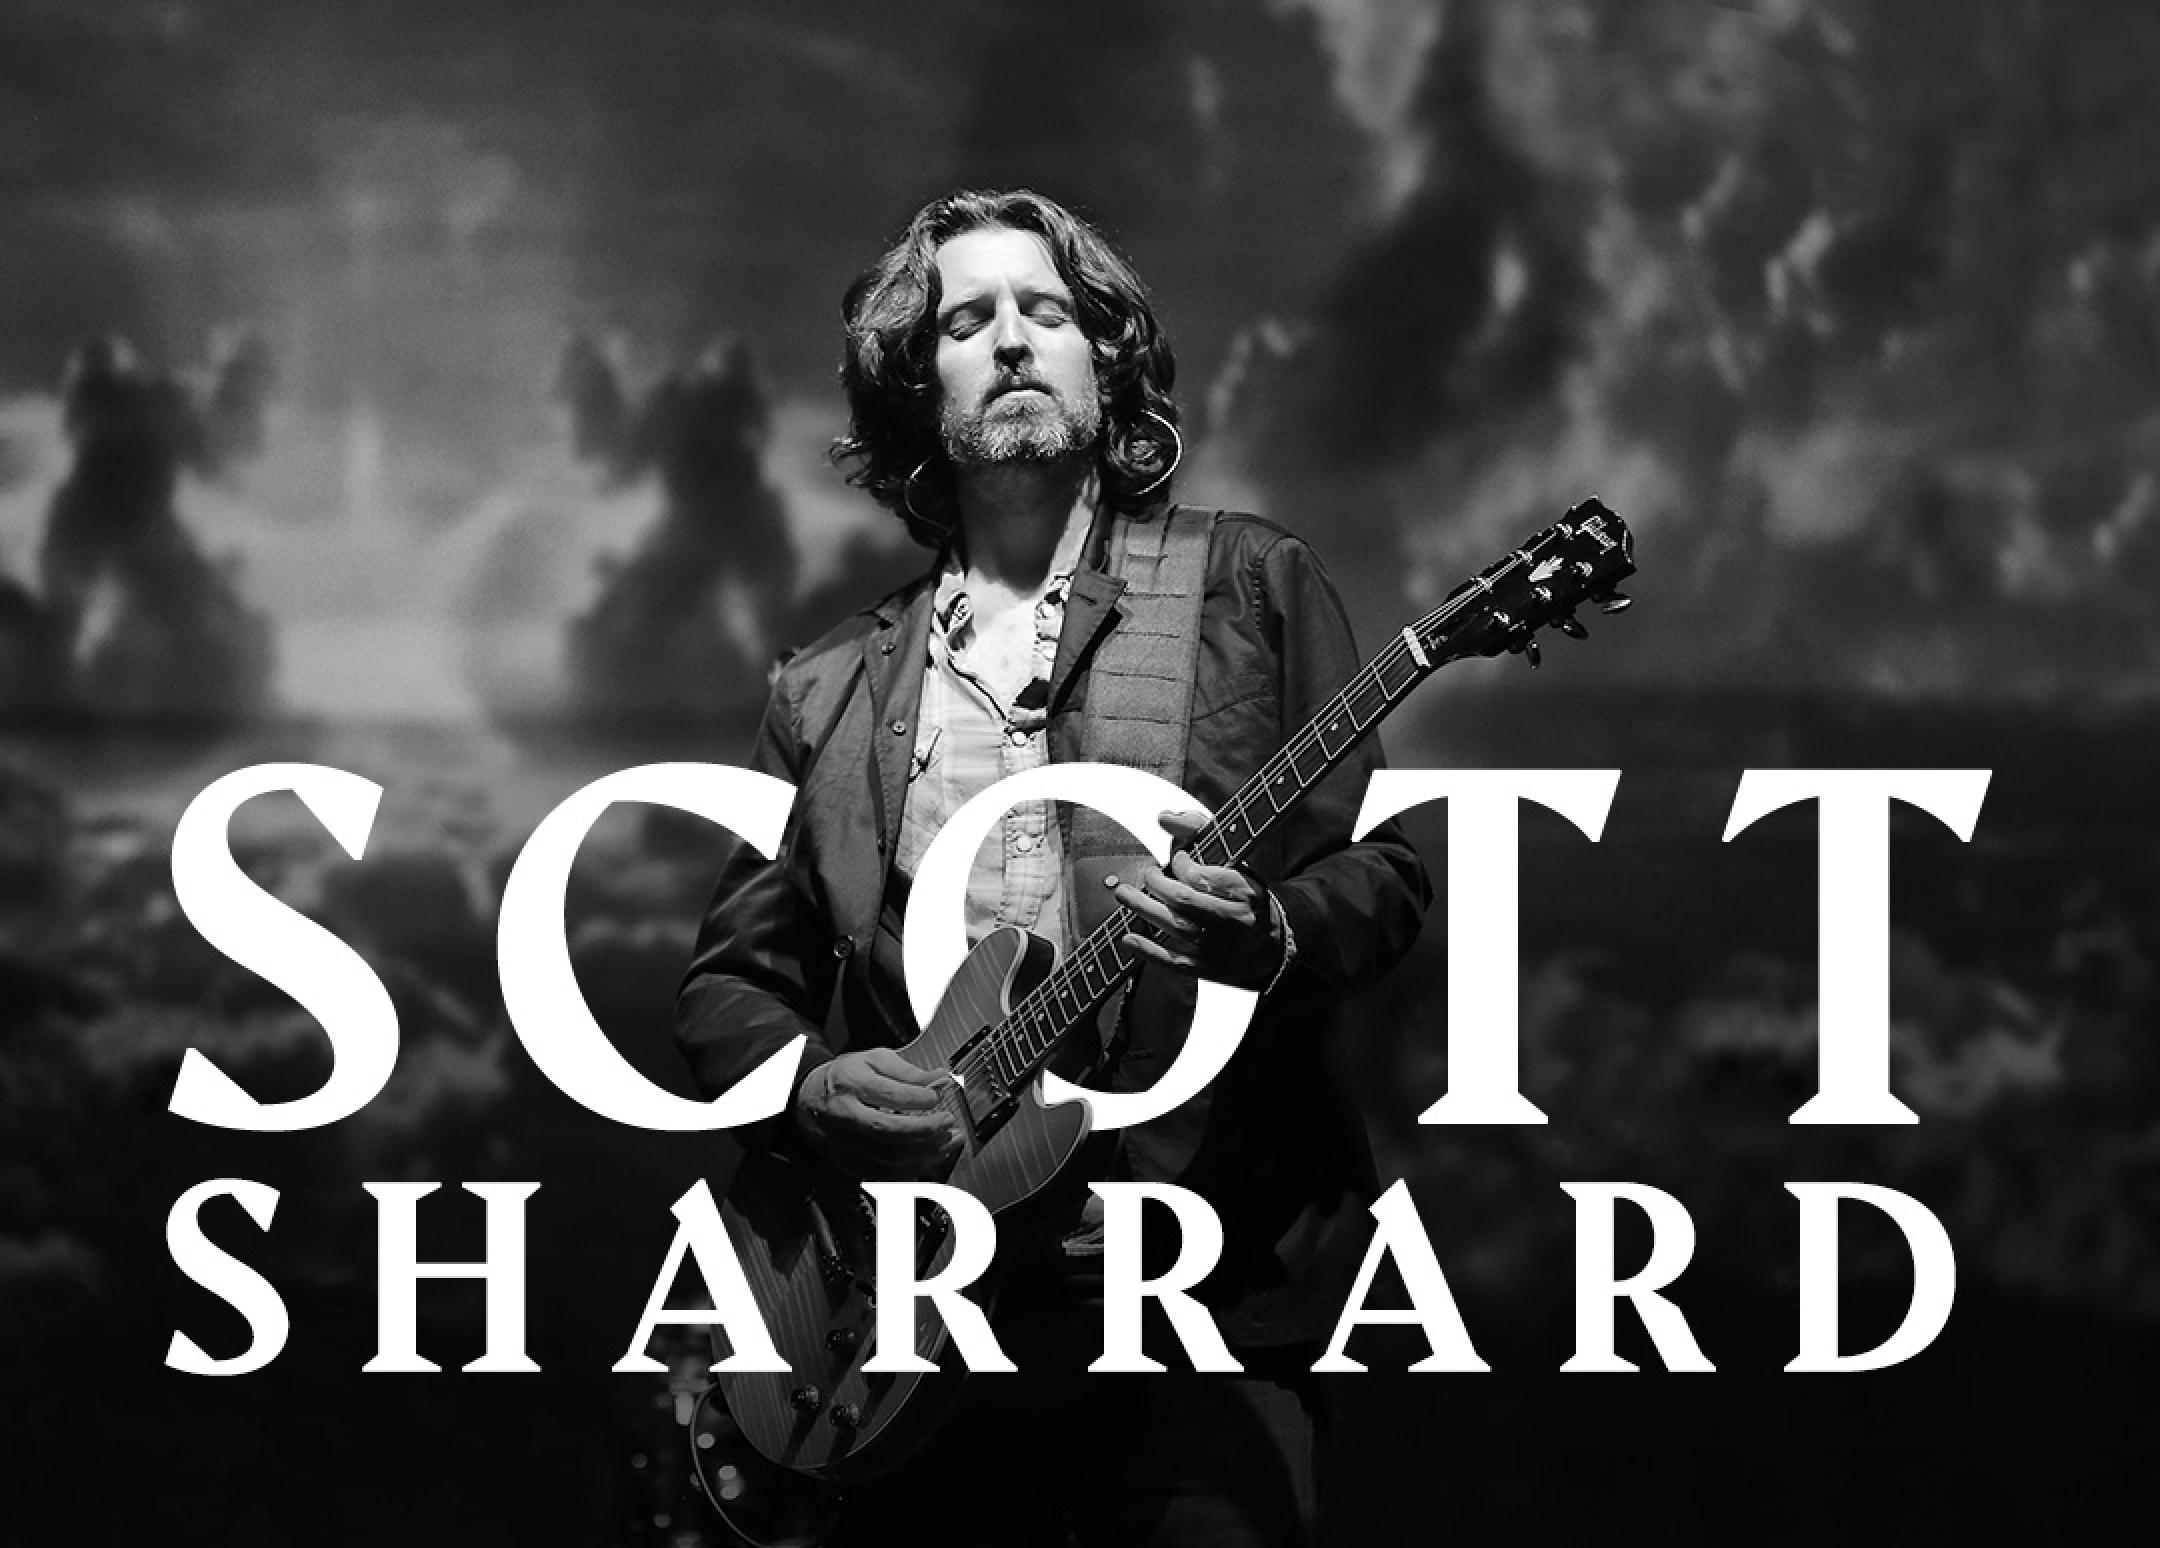 Scott_Sharrard